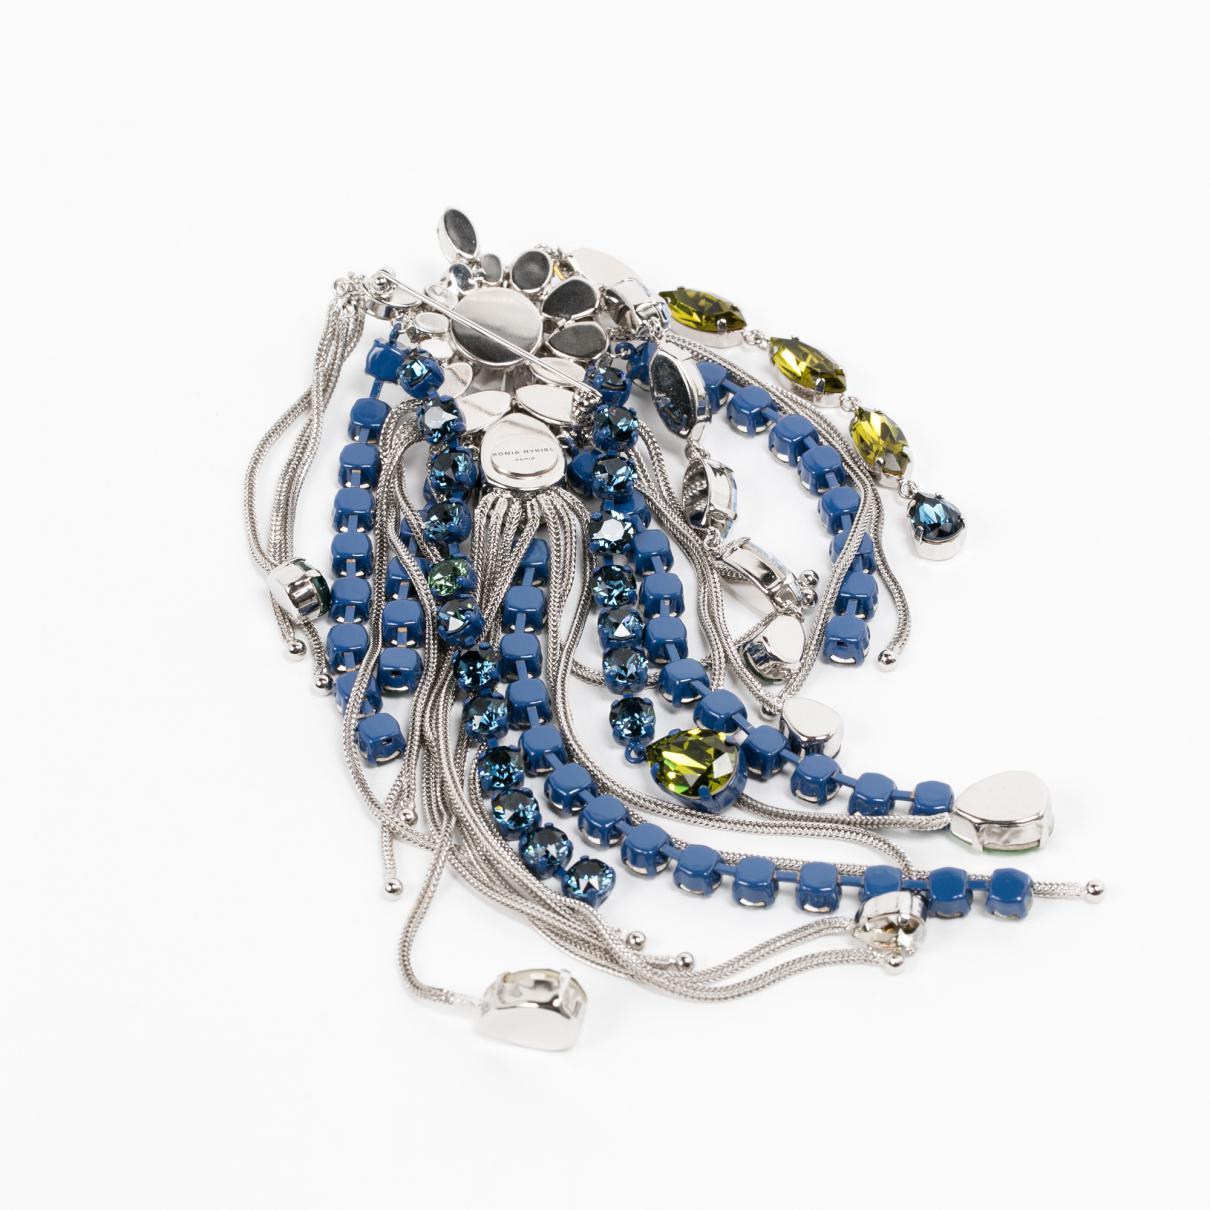 Sonia Rykiel Blue Metal Pins & Brooches